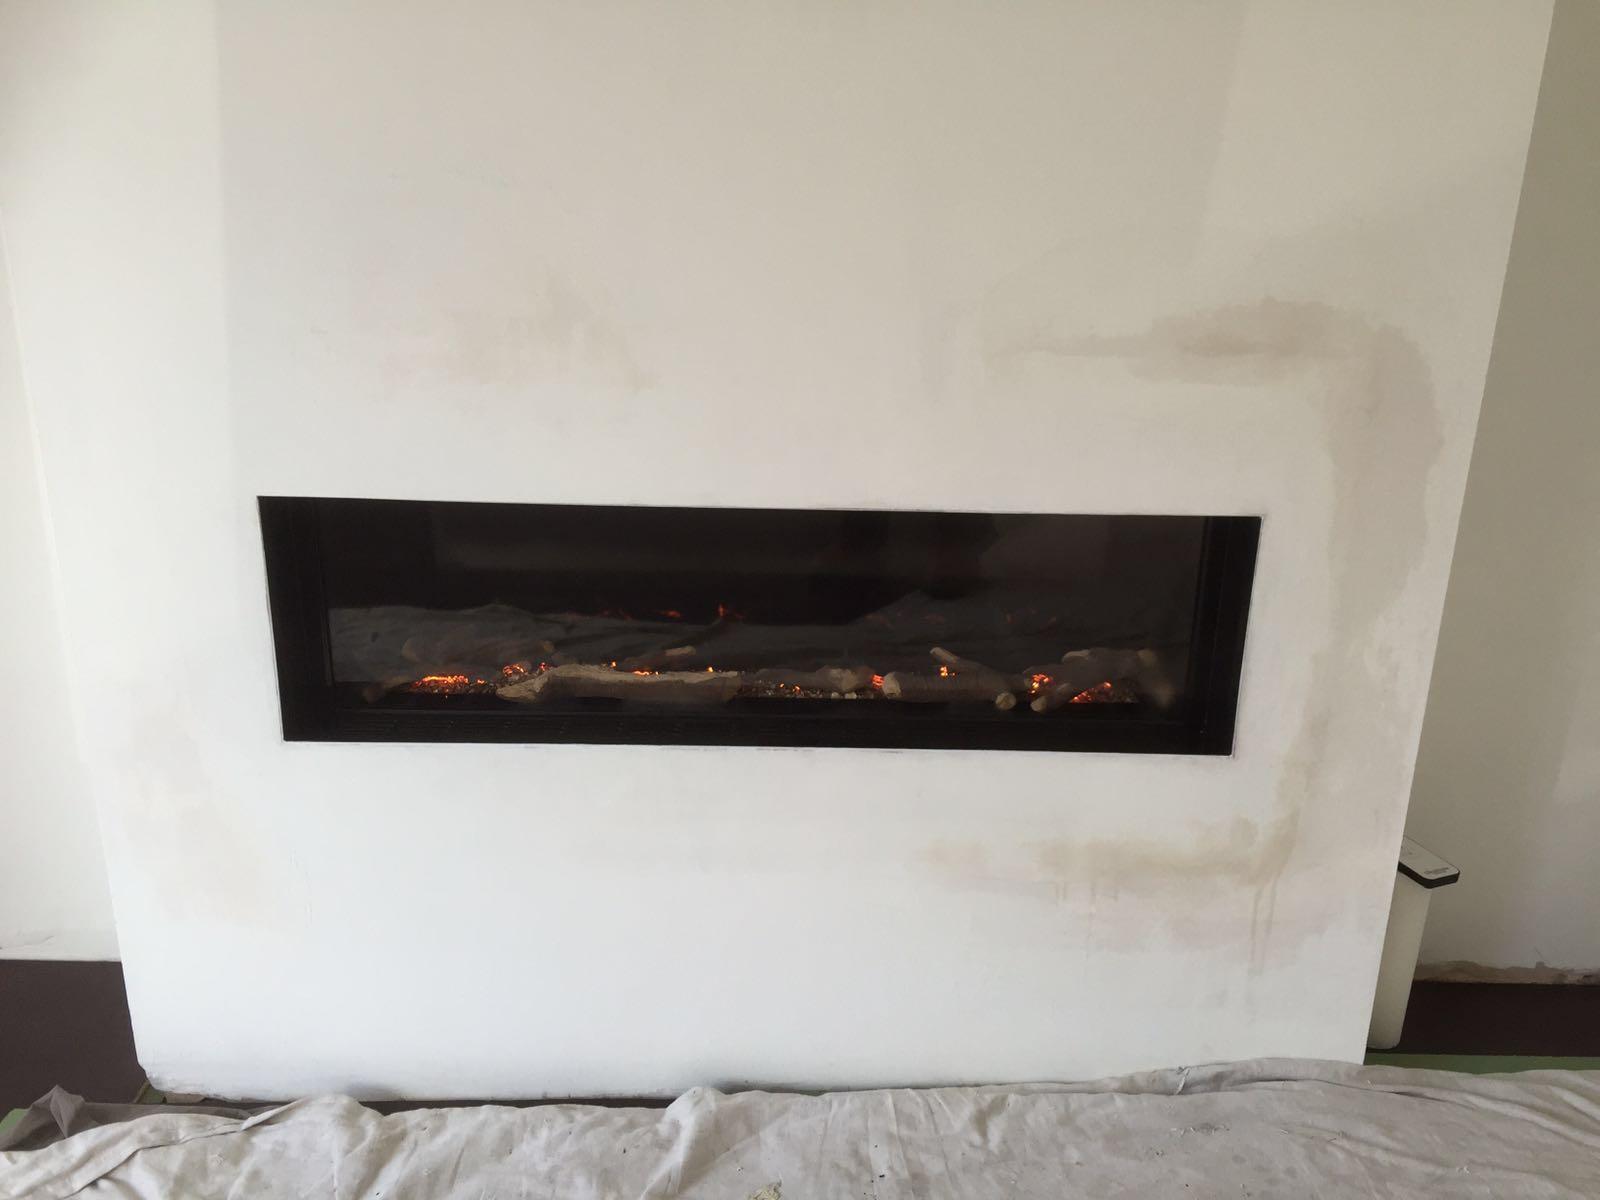 Fire In Wall Part - 24: In Wall Gas Fire Southampton